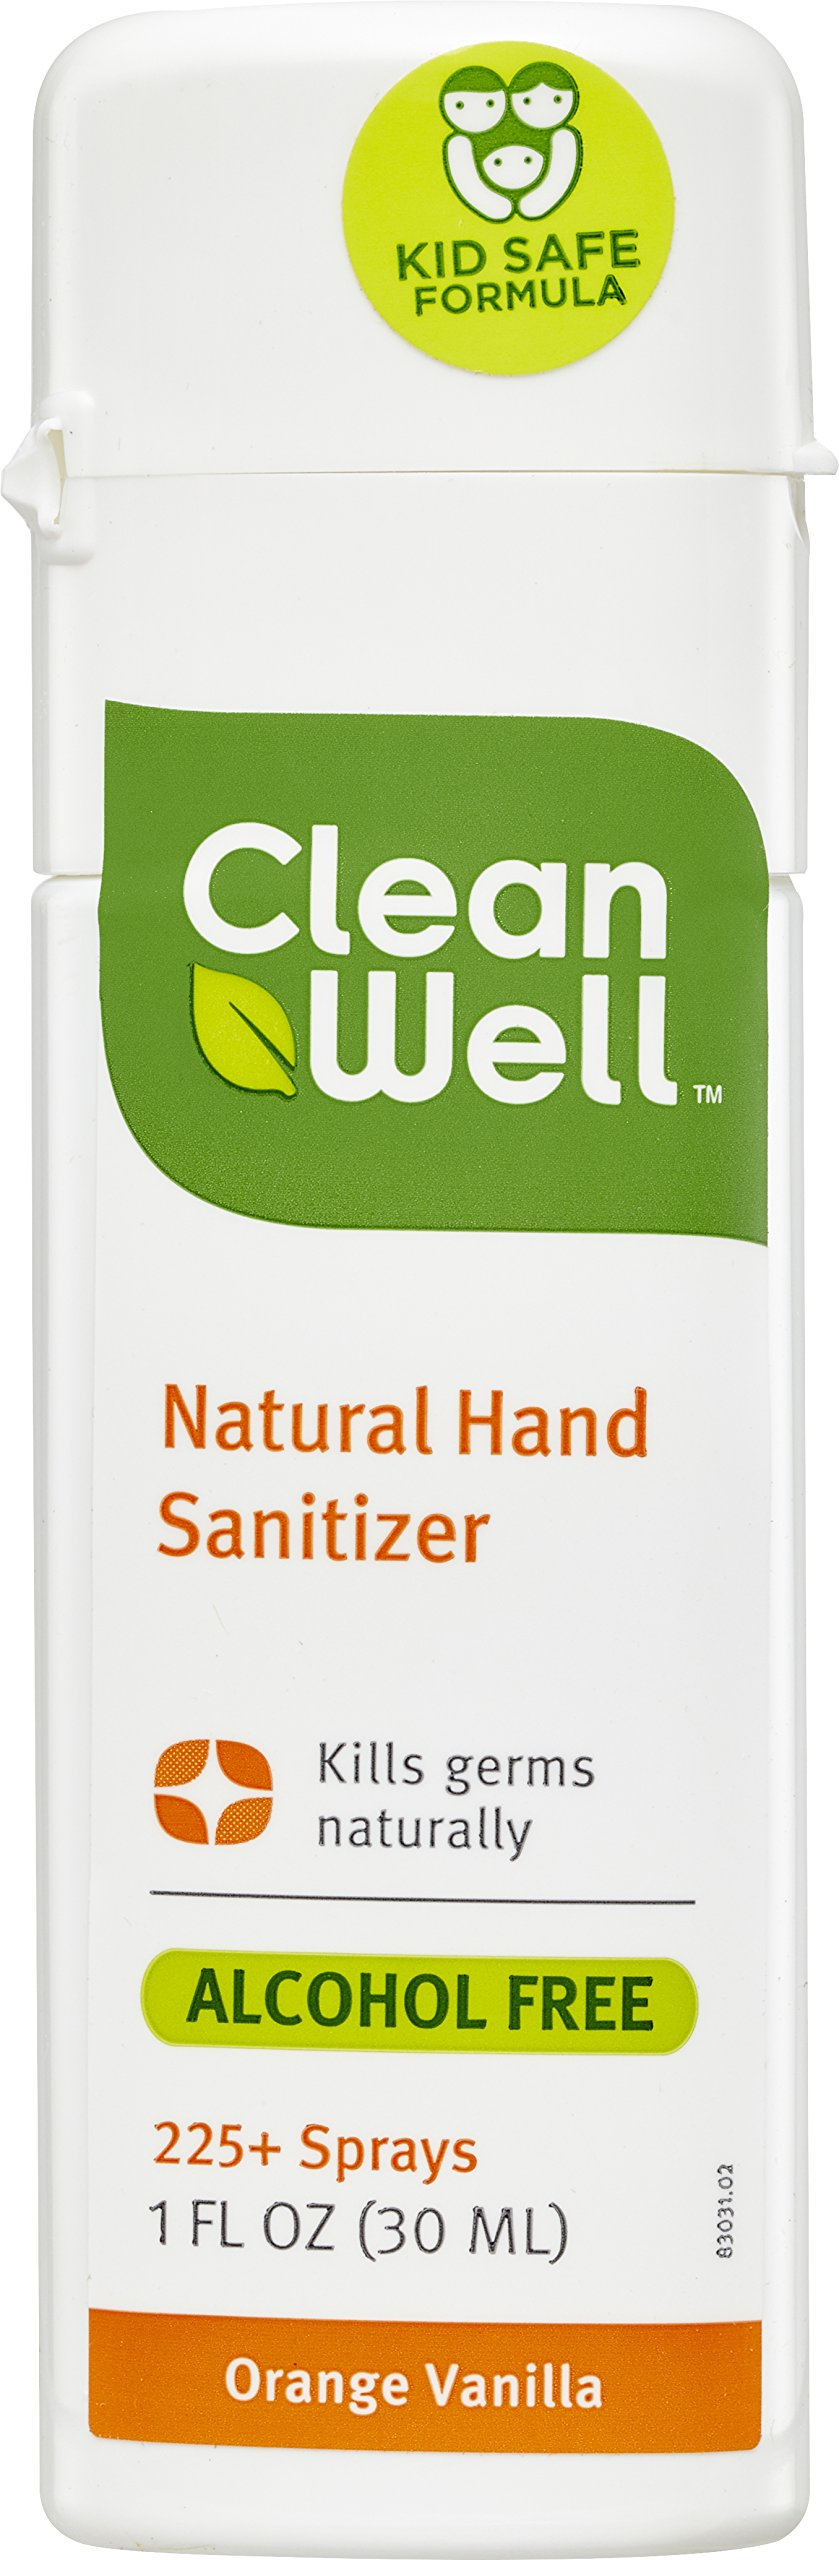 CleanWell® Botanical Hand Sanitizer Spray - Orange Vanilla Scent, 1 Ounce - travel size, plant-based, botanical, alcohol-free, kids friendly, kills germs botanically